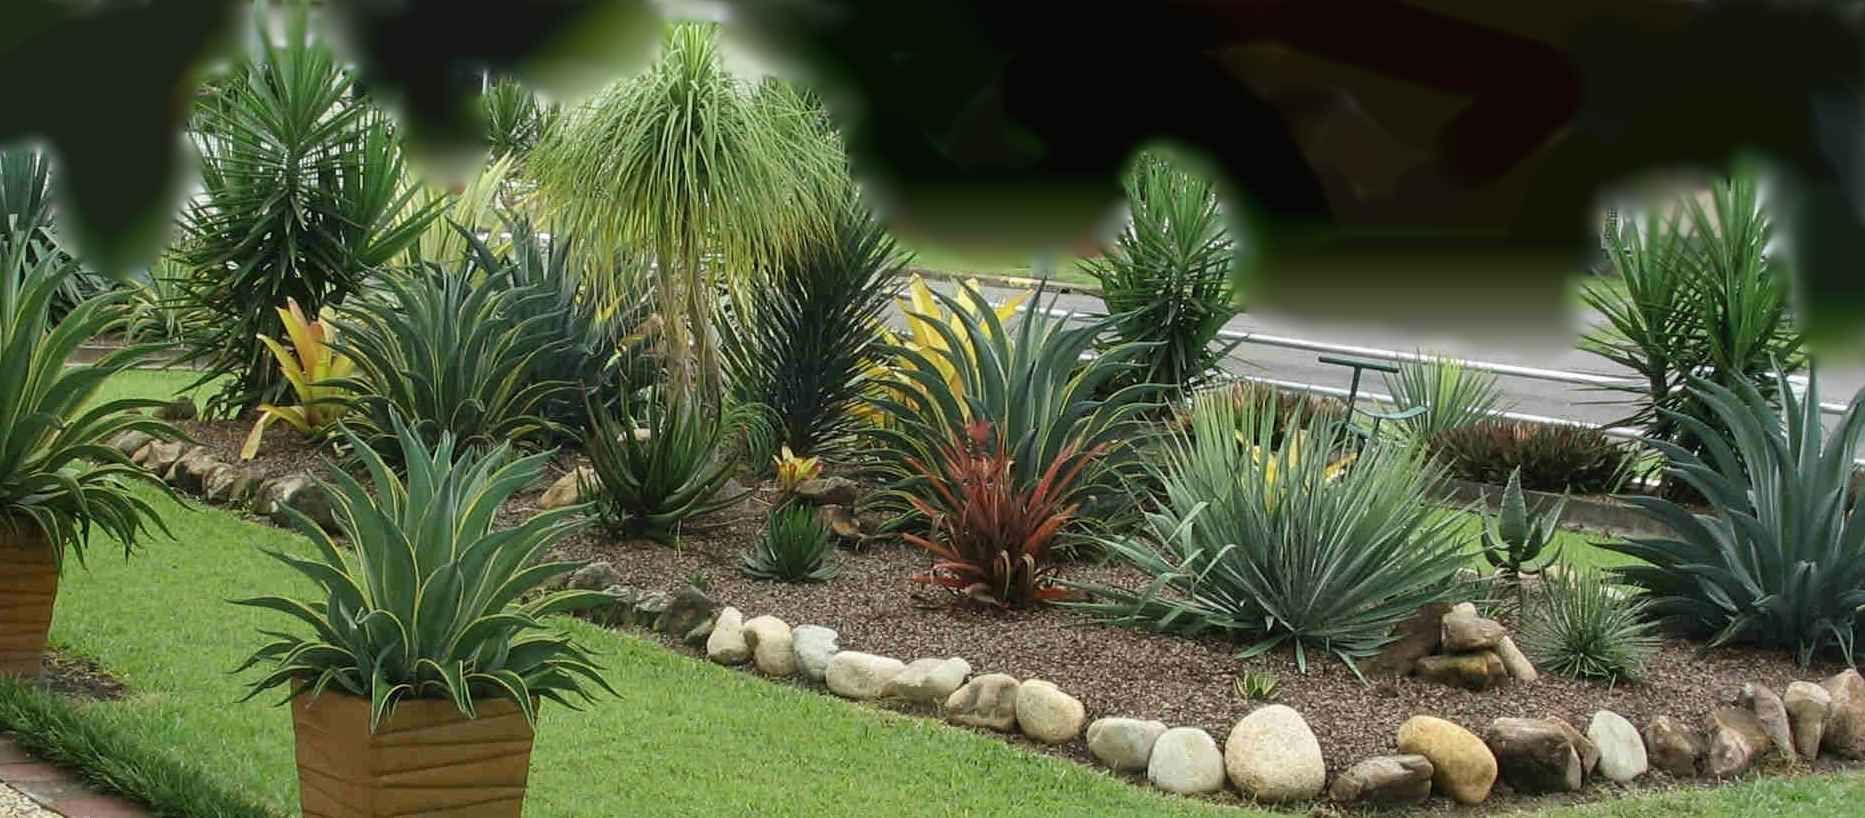 Yucca Agave Plants Landscaping Garden Design Ideas ...